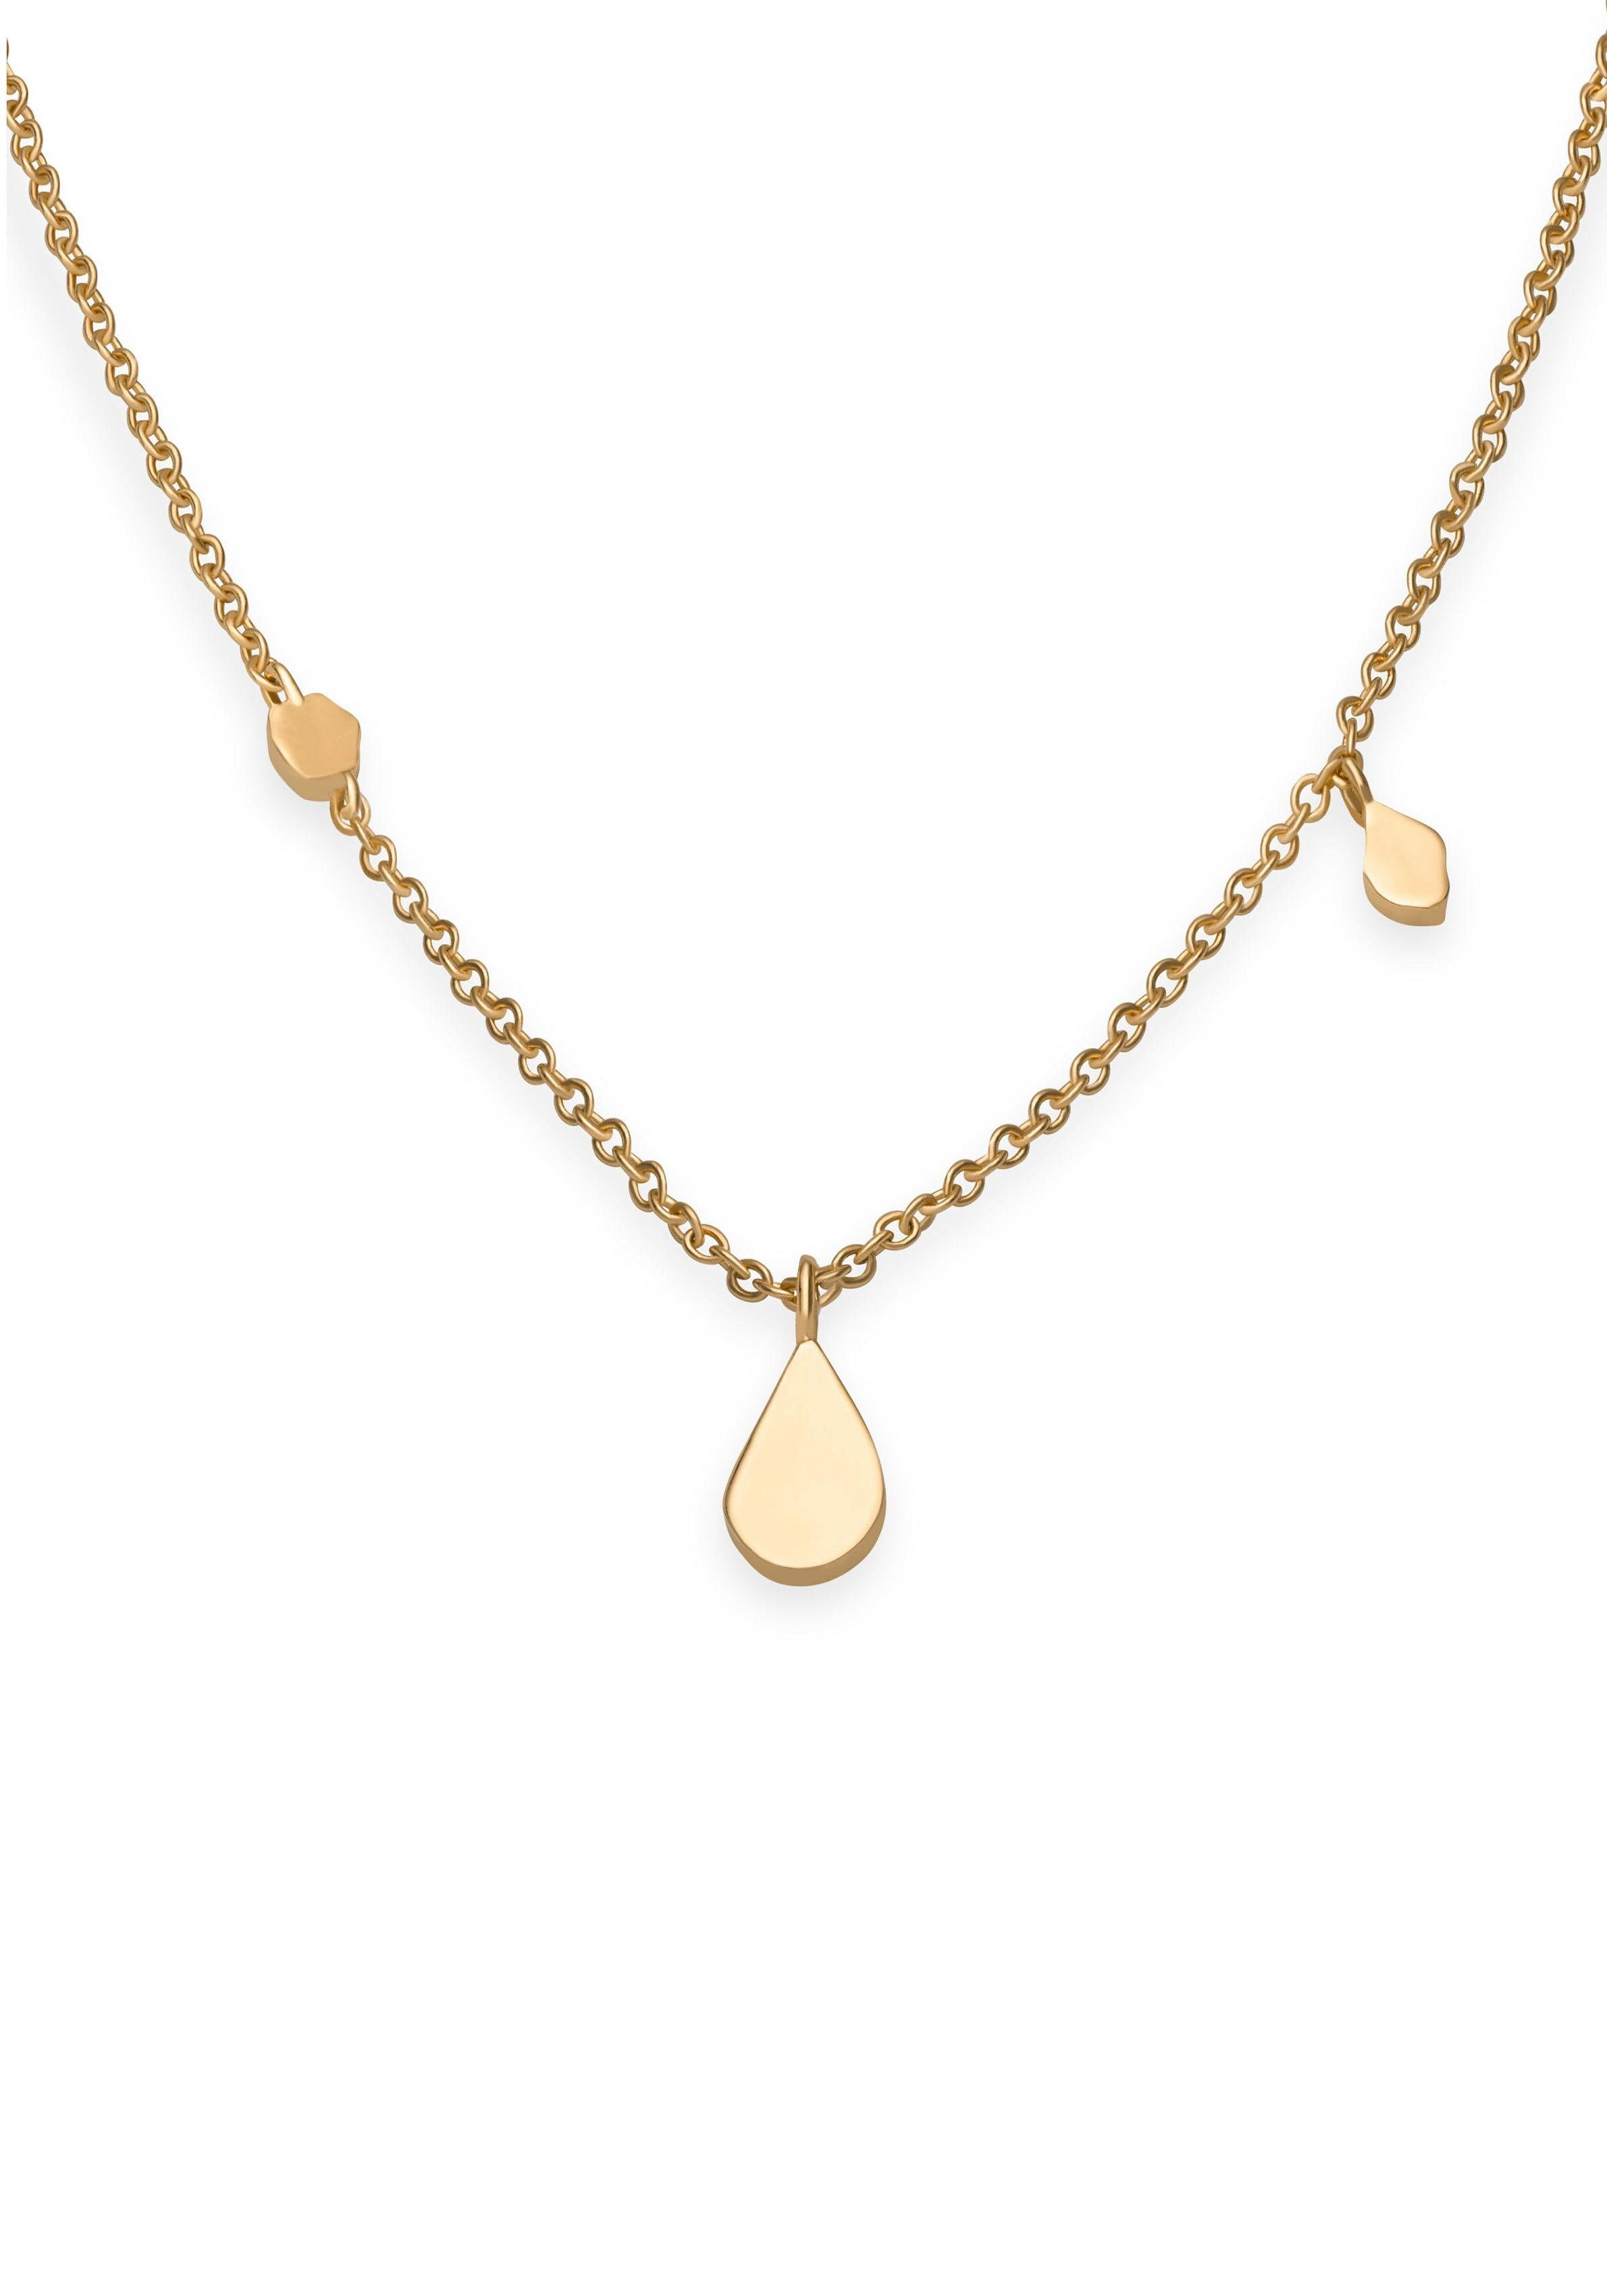 ROSEFIELD Kette mit Anhänger »Iggy Shaped drop necklace gold, JSDNG-J054«